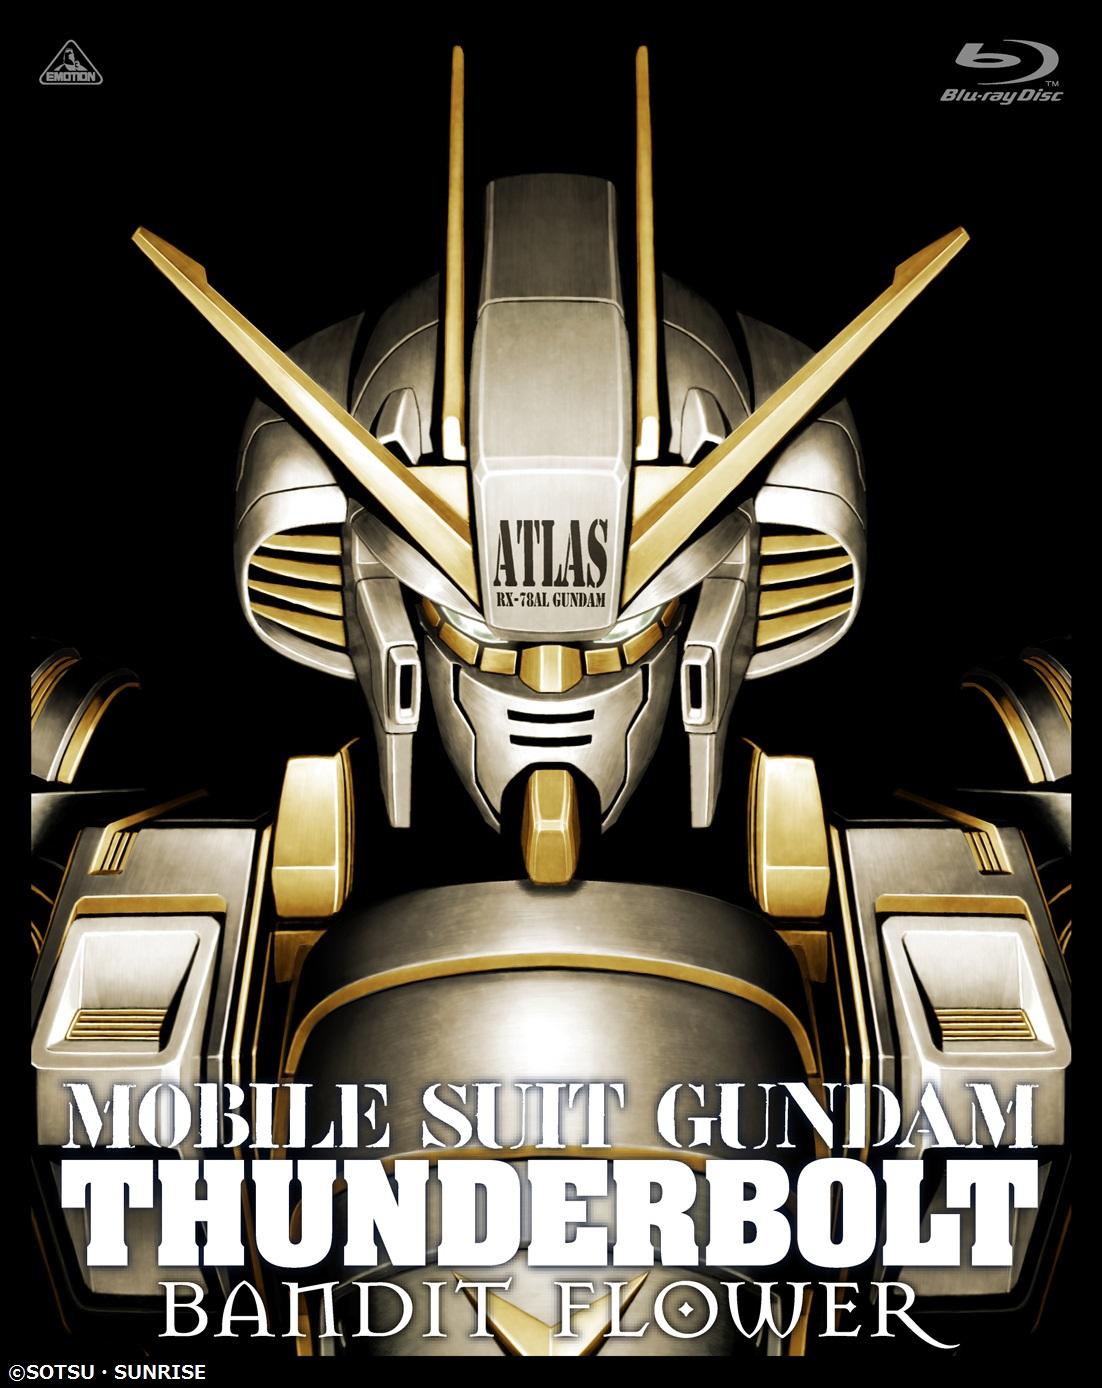 Mobile Suit Gundam Thunderbolt Bandit Flower 4K ULTRA HD Blu-Ray (Import)